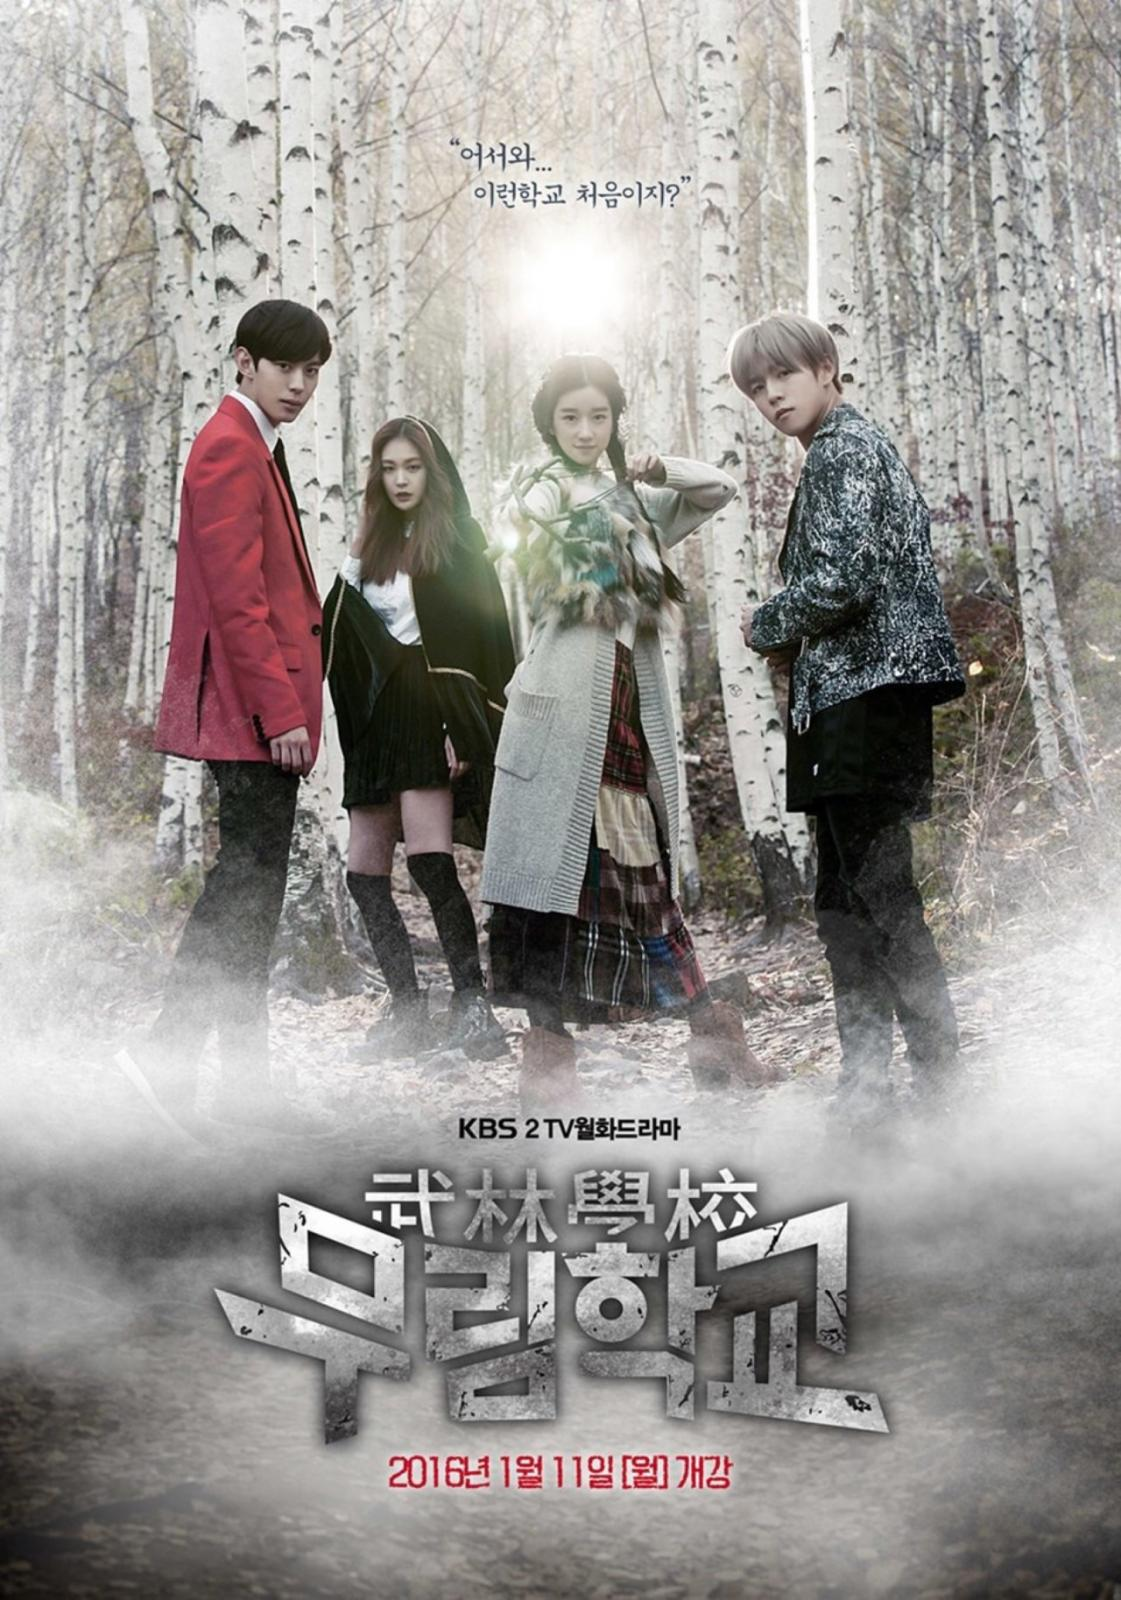 Сериал Школа Мурим ~ Moorim HAKGYO 무림학교 ~ Moorim School Saga of the Brave (Южная Корея)